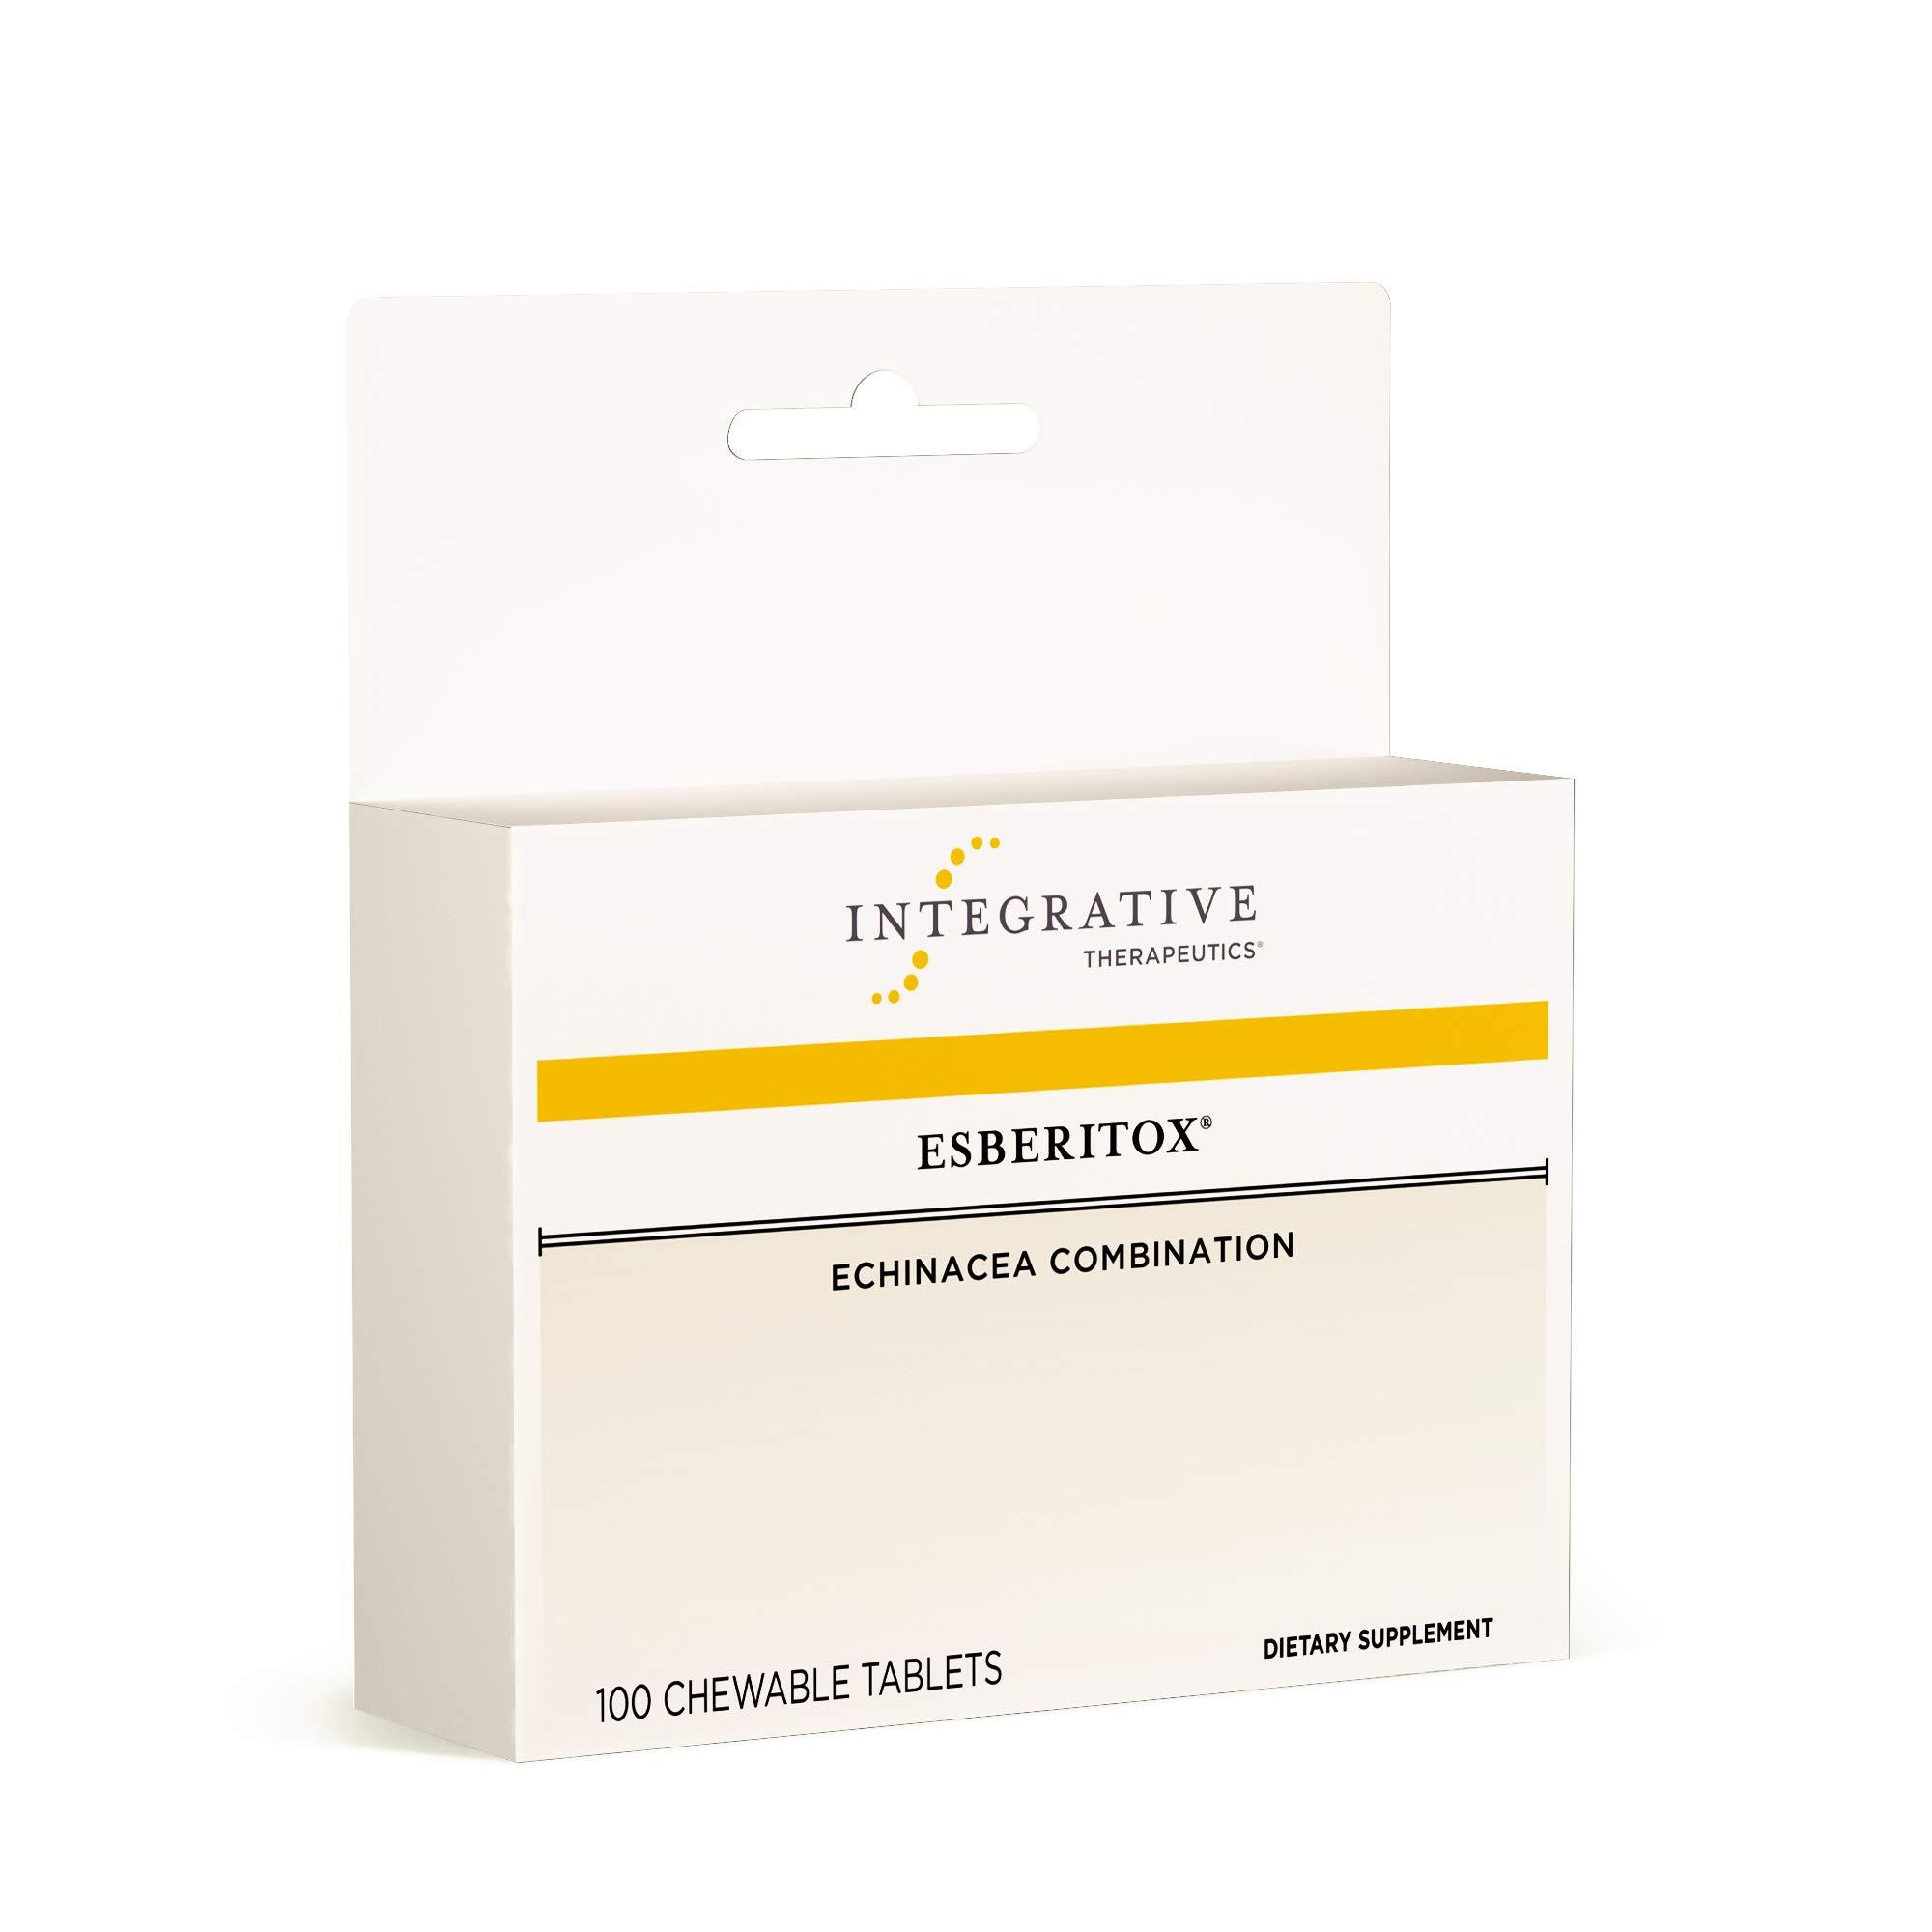 Integrative Therapeutics - Esberitox - Immune-Supporting Combination of Echinacea, Baptisia, and Thuja - 100 Chewable Tablets